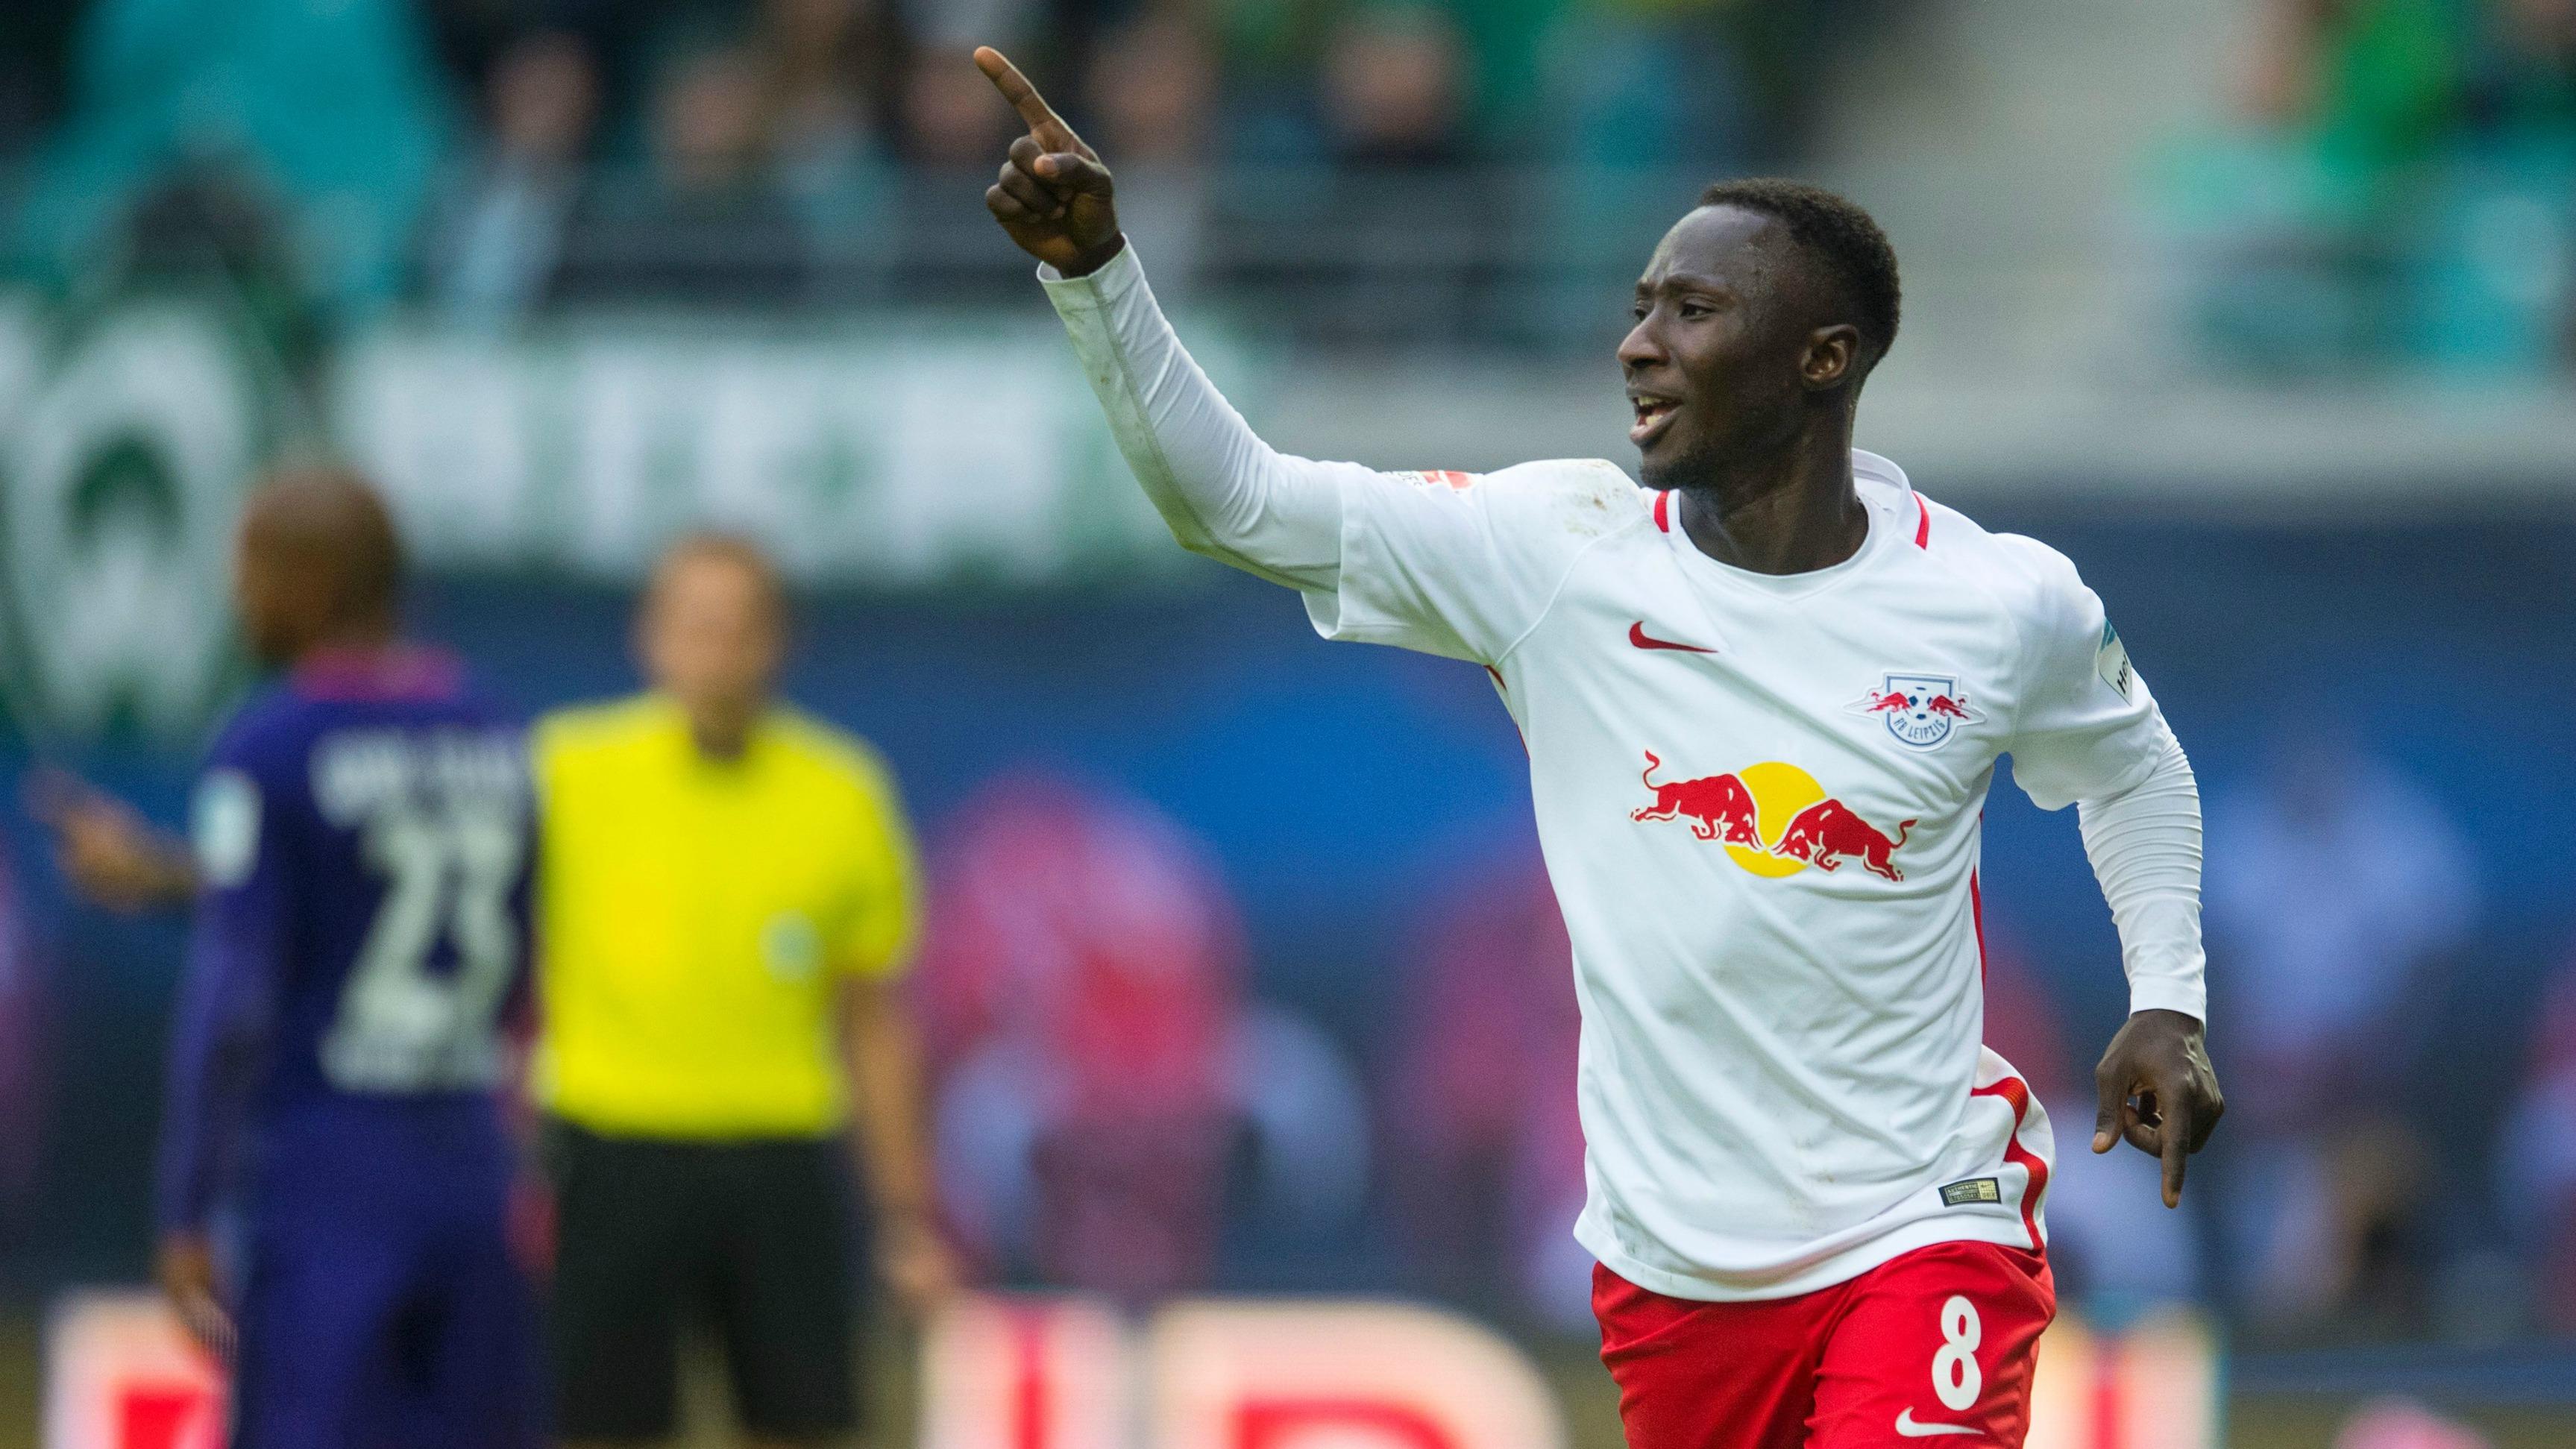 Watch Naby Keita beat the entire Bremen defense as RB Leipzig win again